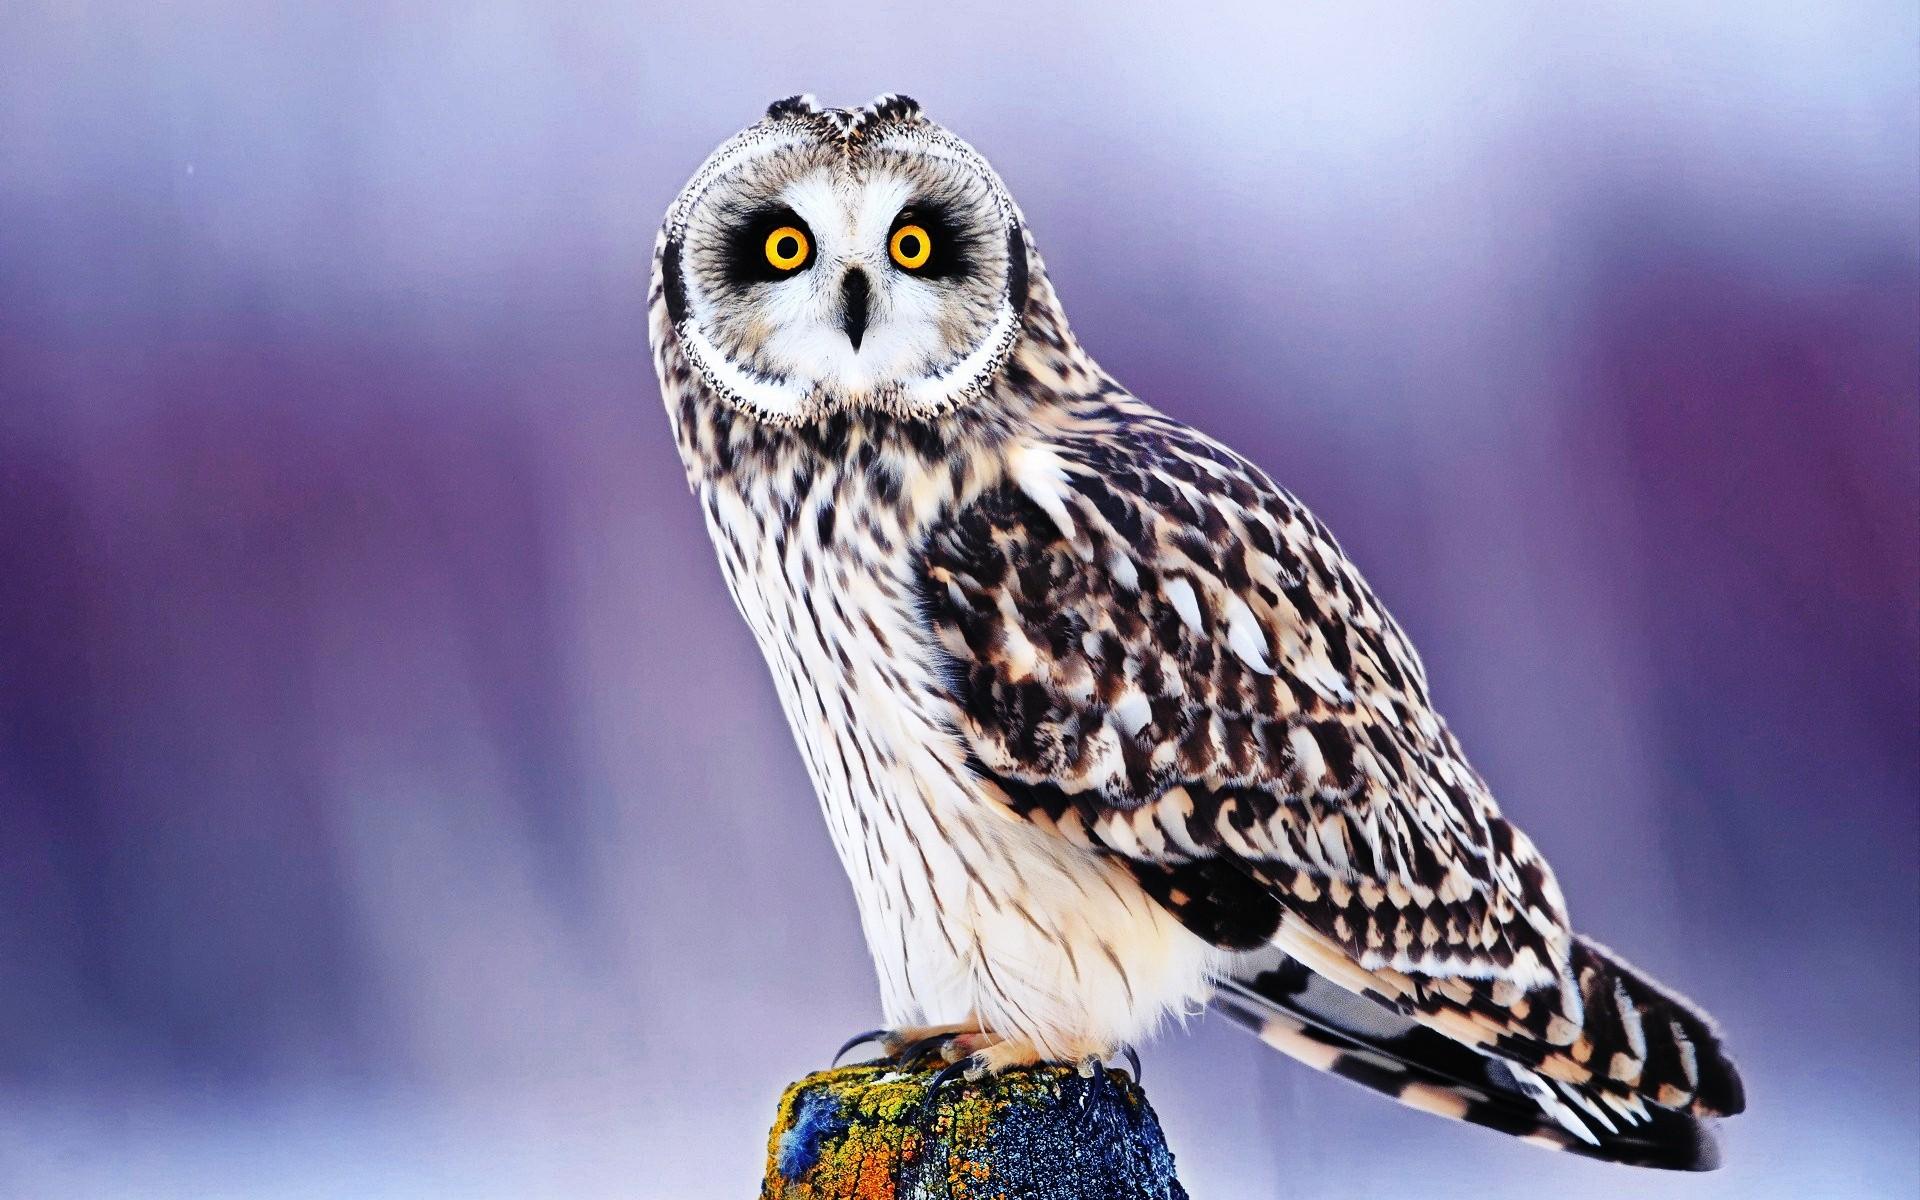 best ideas about Owl wallpaper iphone on Pinterest Owl